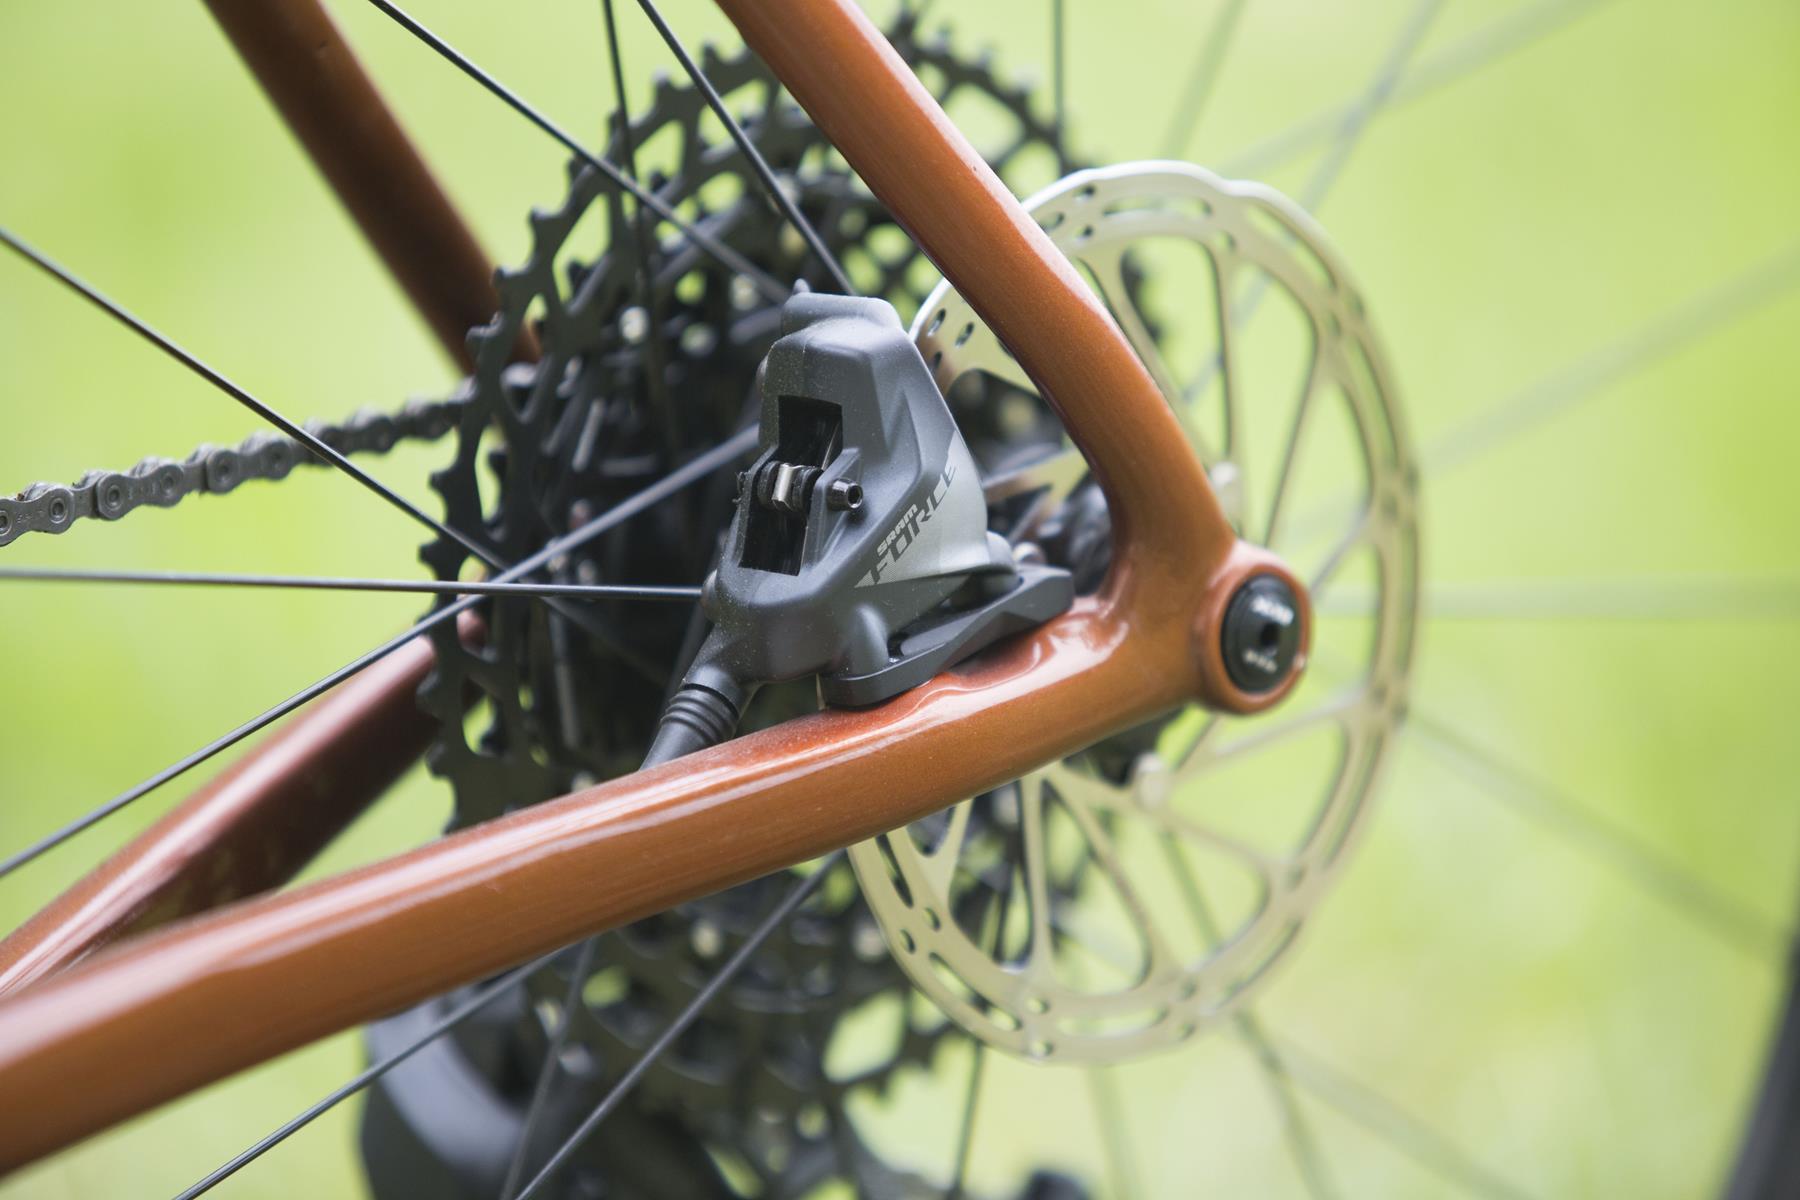 gravel_bicikl14.jpg (148 KB)